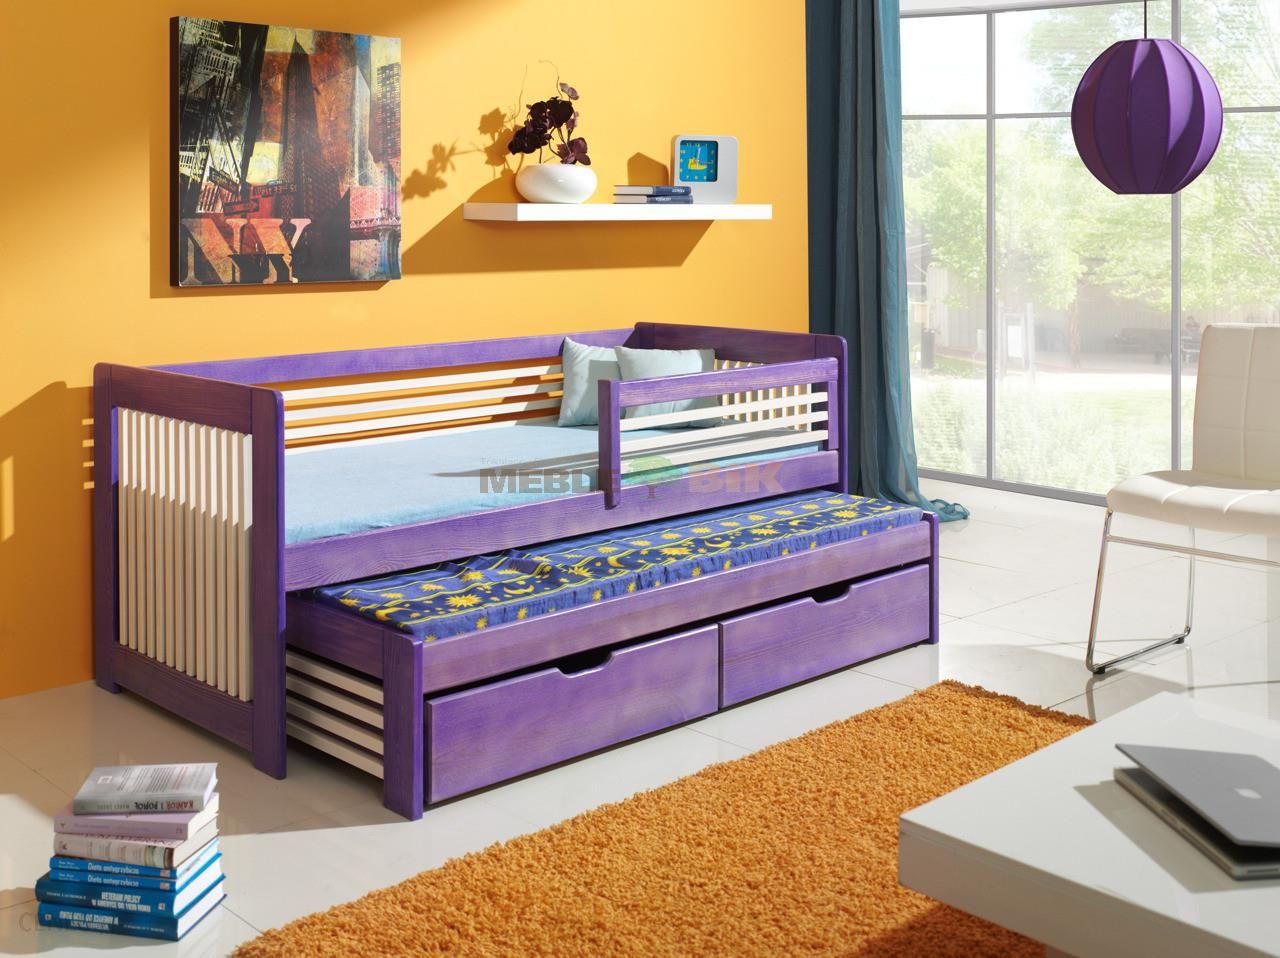 Bed łóżko Anatol 80x185cm